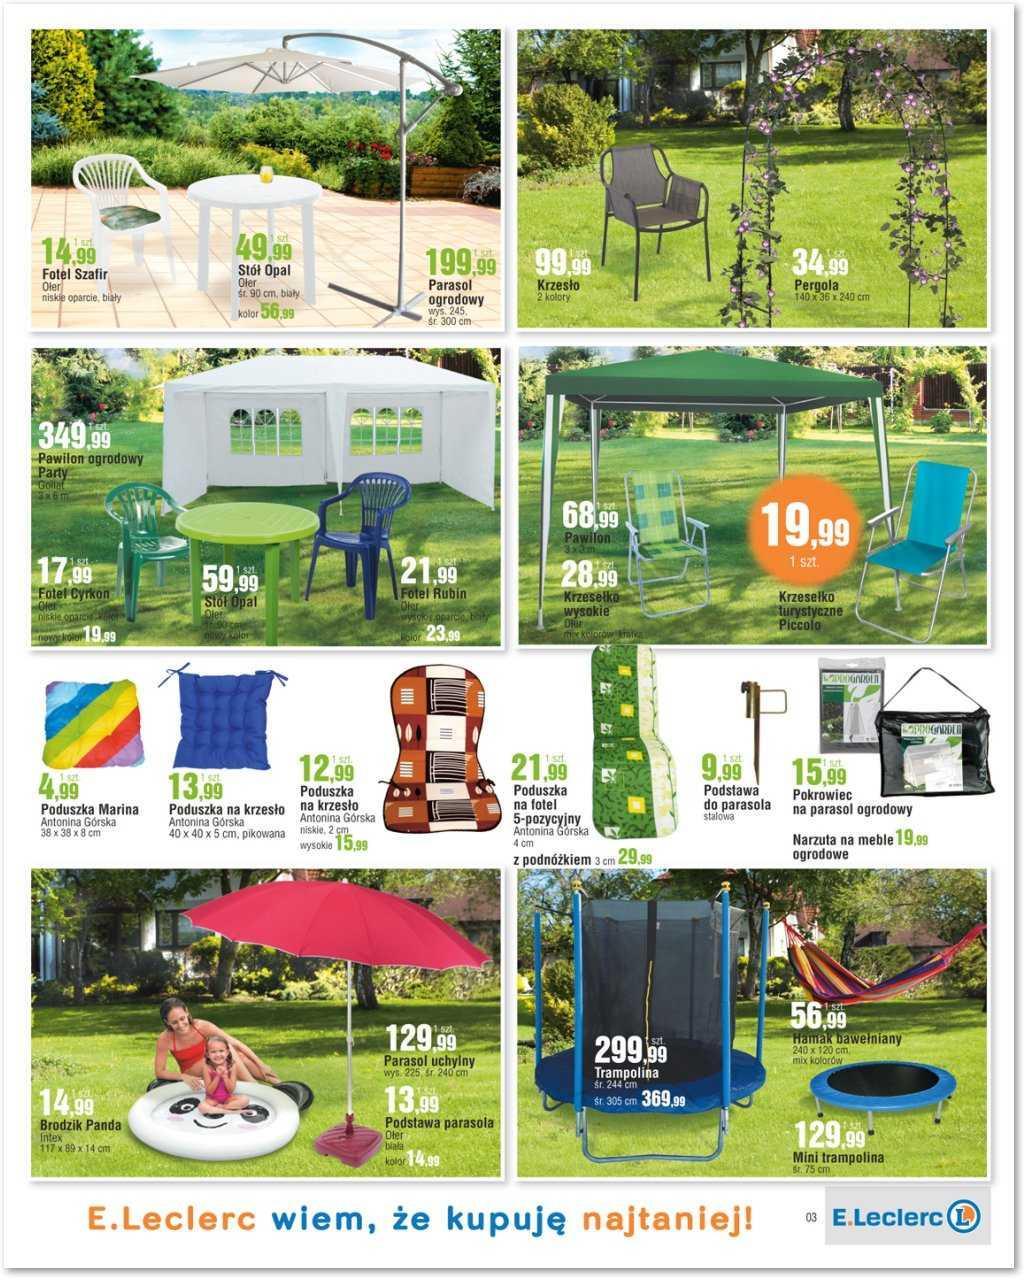 gazetka promocyjna i reklamowa e leclerc przygotuj si na lato od 04 05 2016 do 14 05 2016 s 3. Black Bedroom Furniture Sets. Home Design Ideas